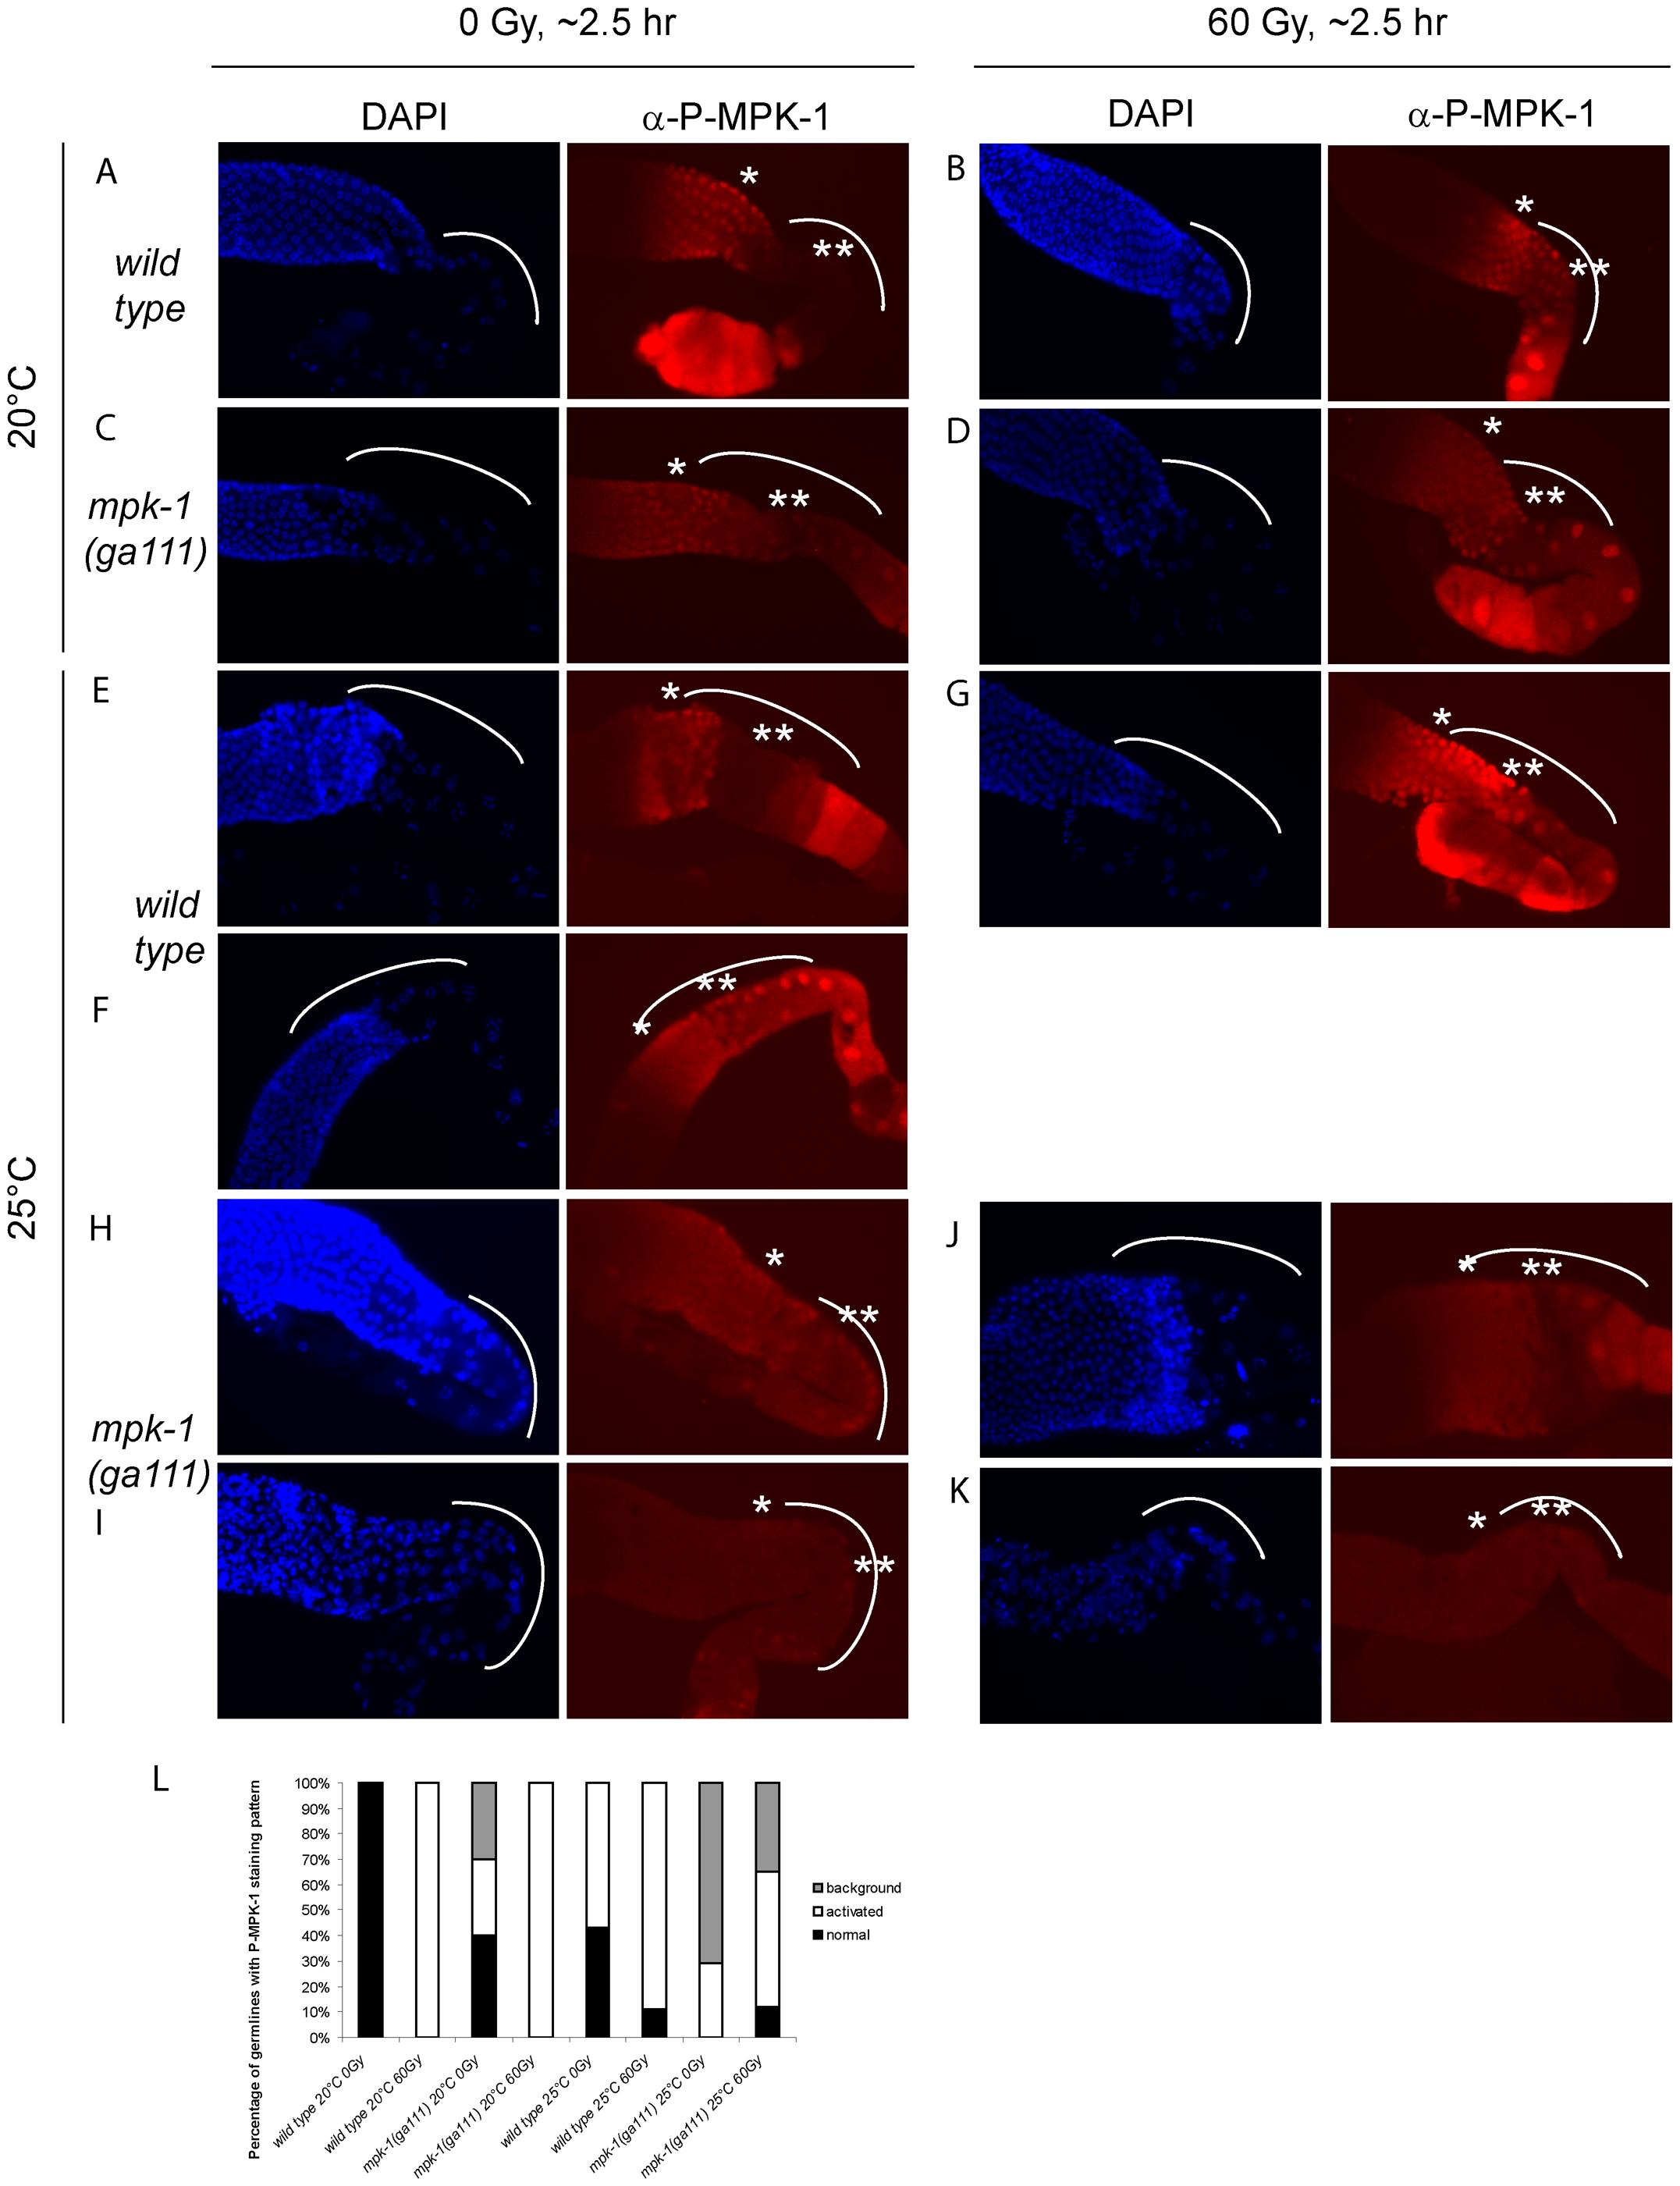 MPK-1 phosphorylation is slightly increased by irradiation in <i>mpk-1(ga111ts)</i> mutants raised at 25°C.